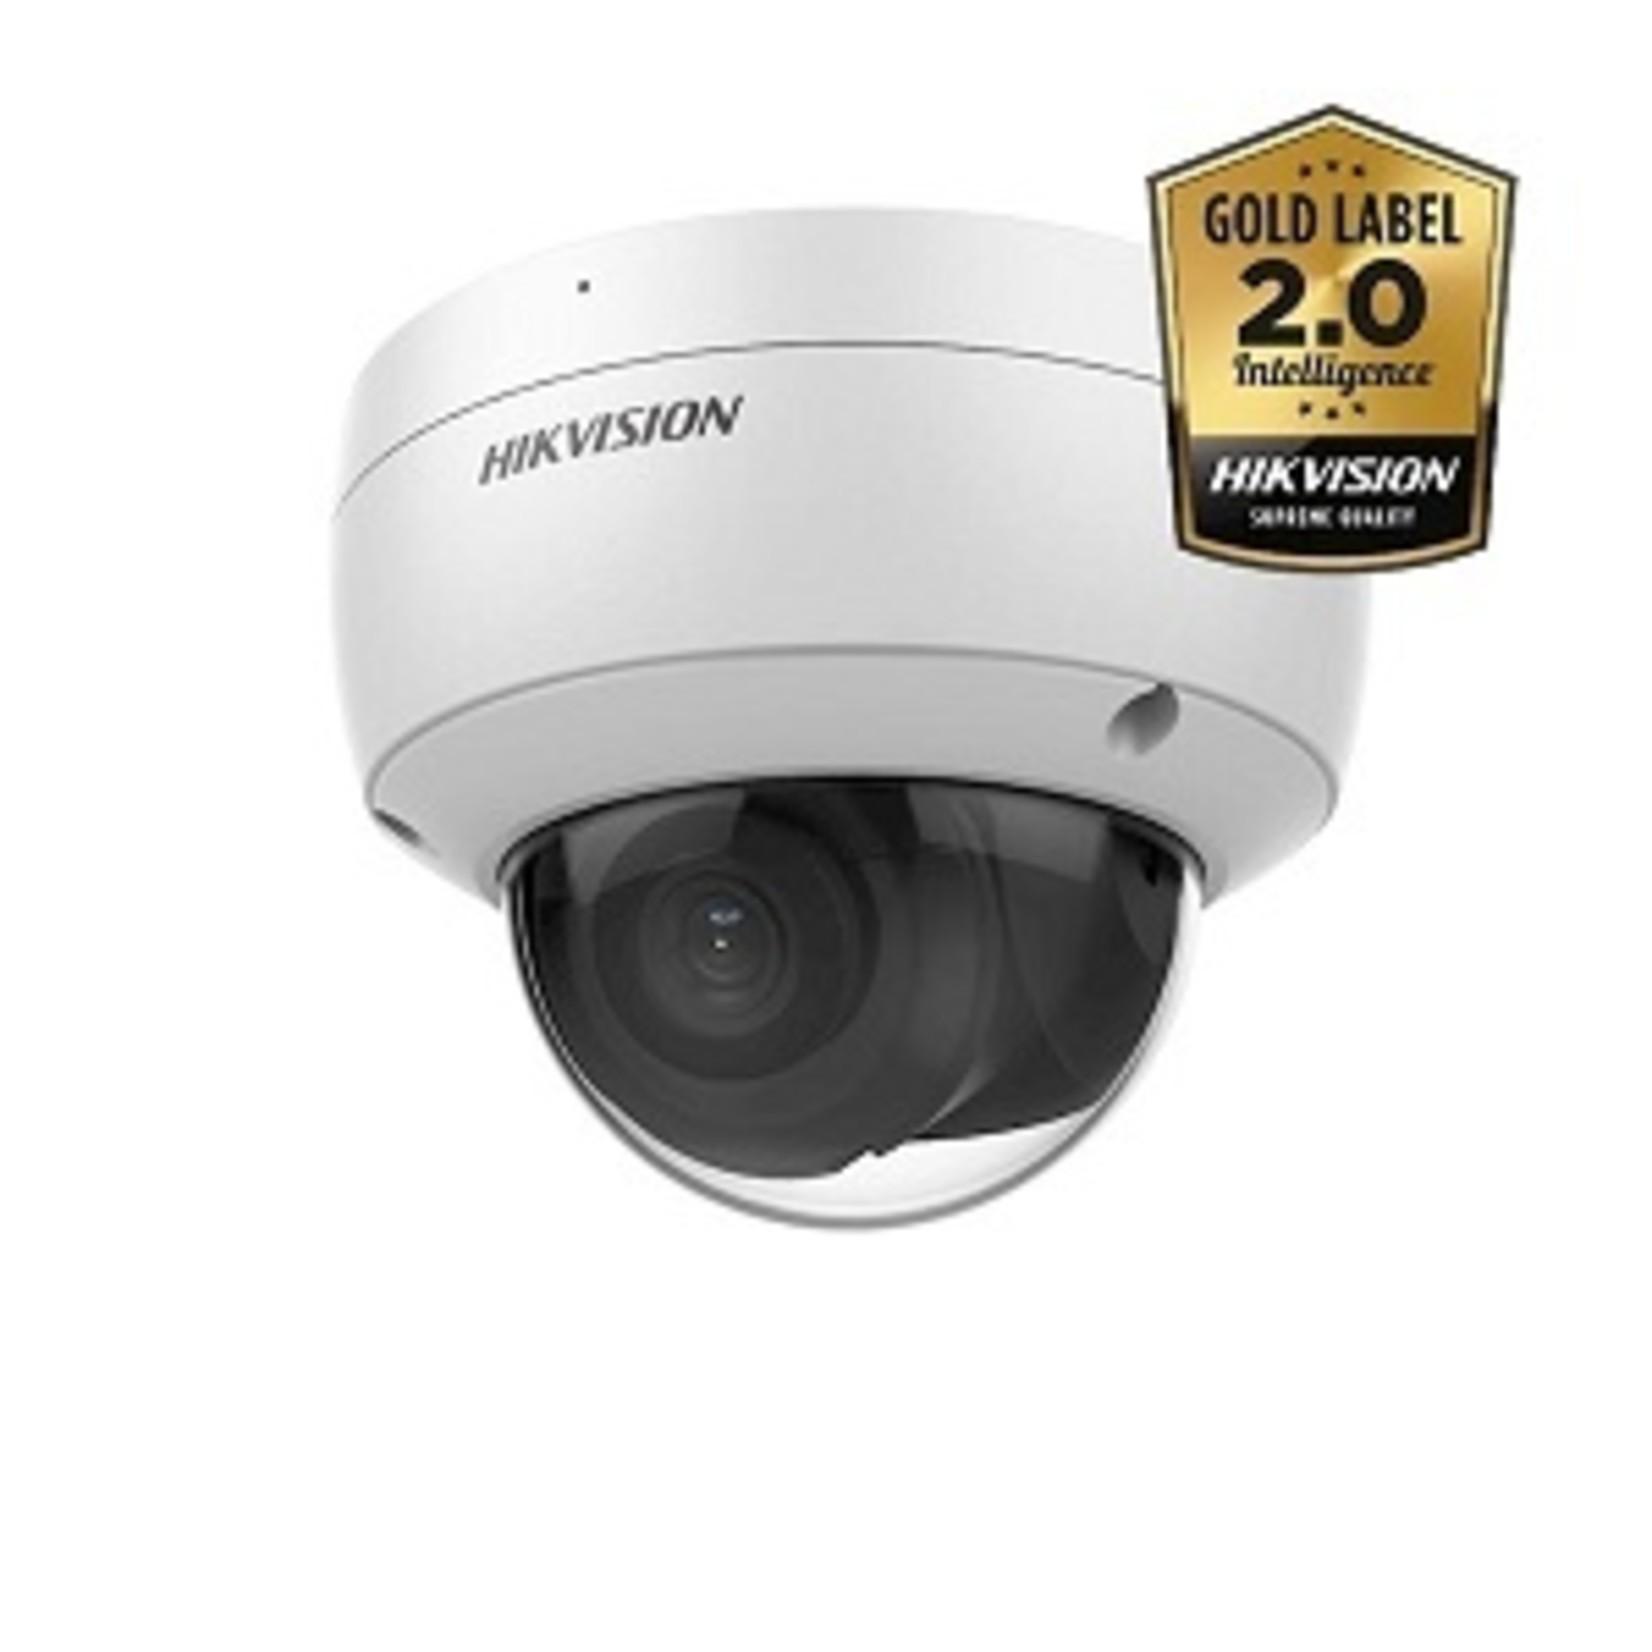 Hikvision DS-2CD2126G2-I, 2MP, 30m IR, WDR, Ultra Low Light